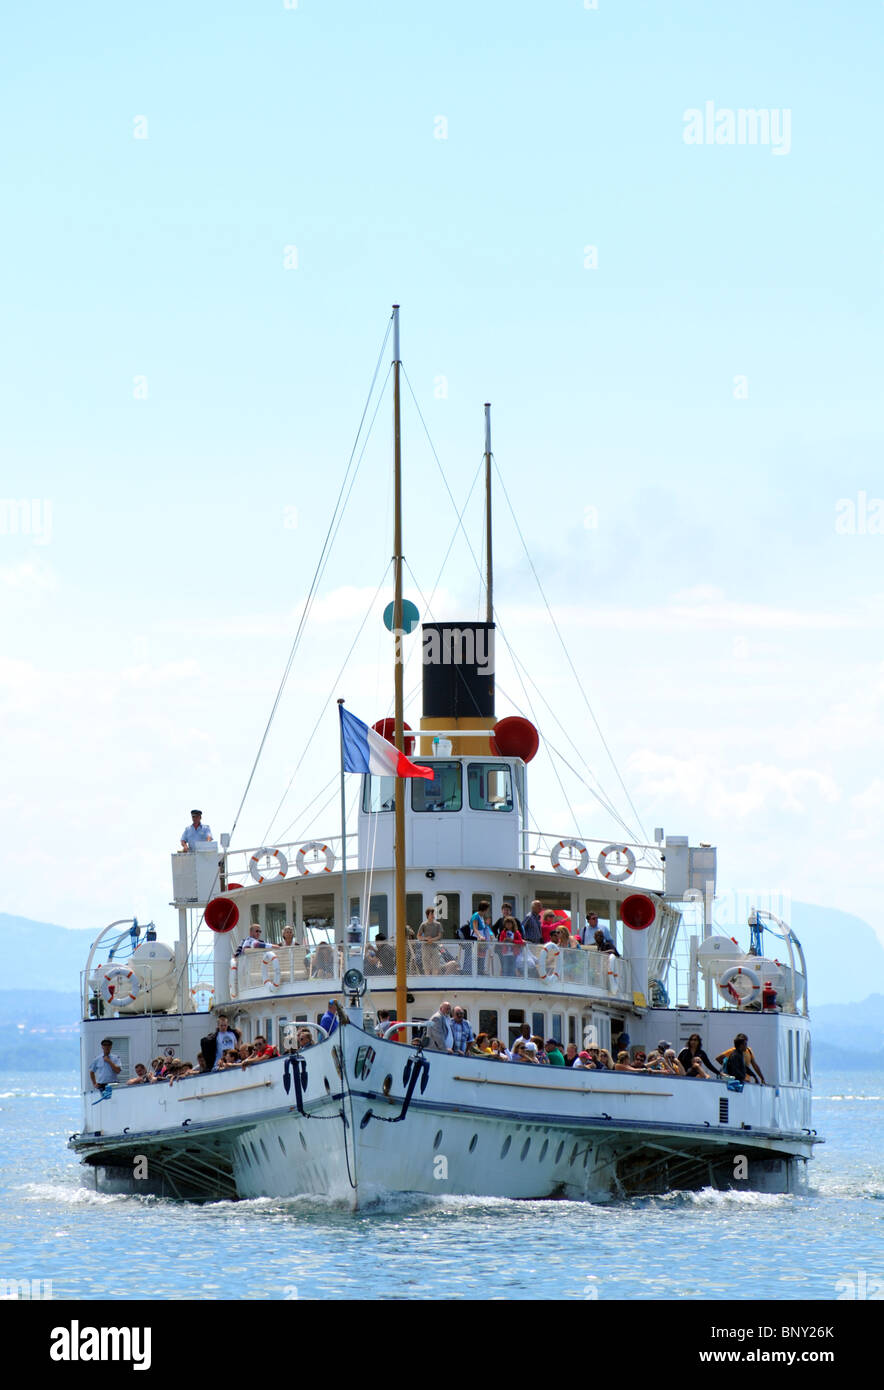 Passenger ferry, paddle steamer at Lausanne, Switzerland, Europe - Stock Image